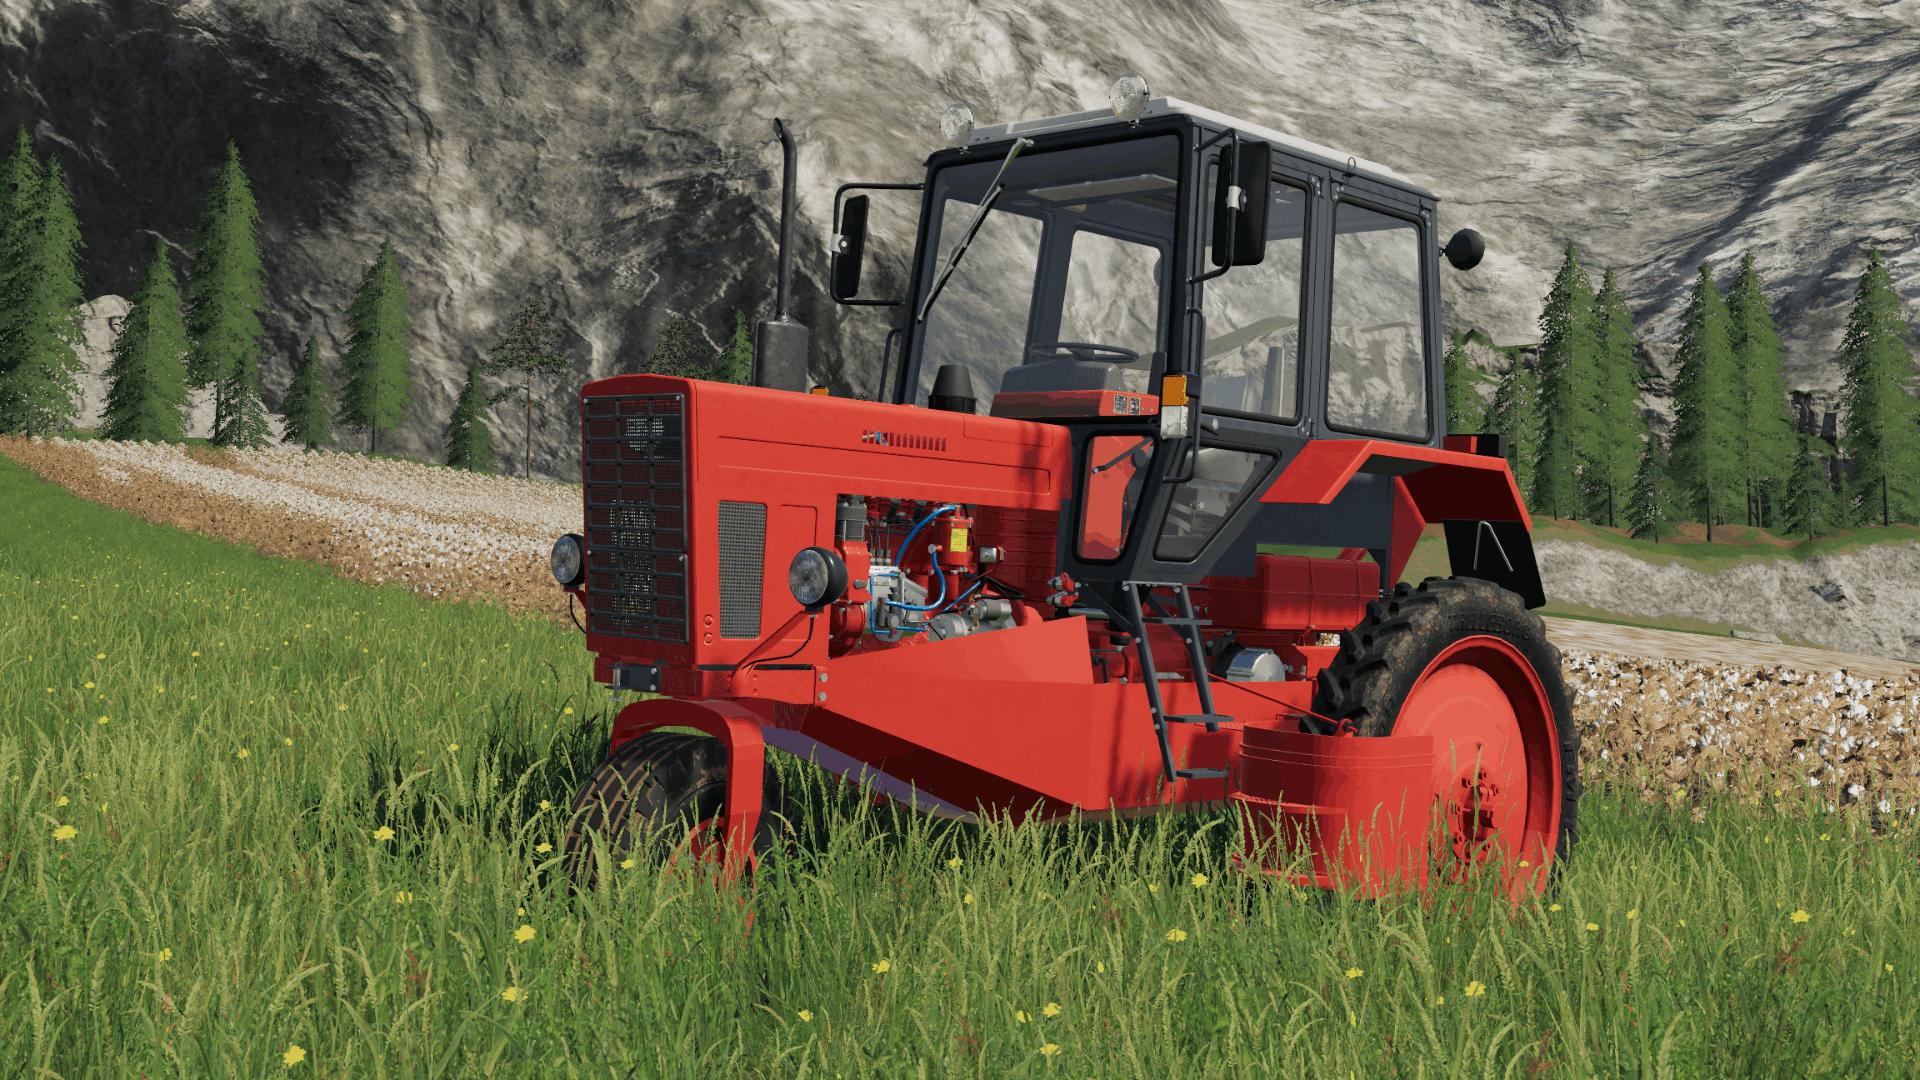 Harsvester MTZ80 for cotton Mod - Farming Simulator 19 Mod